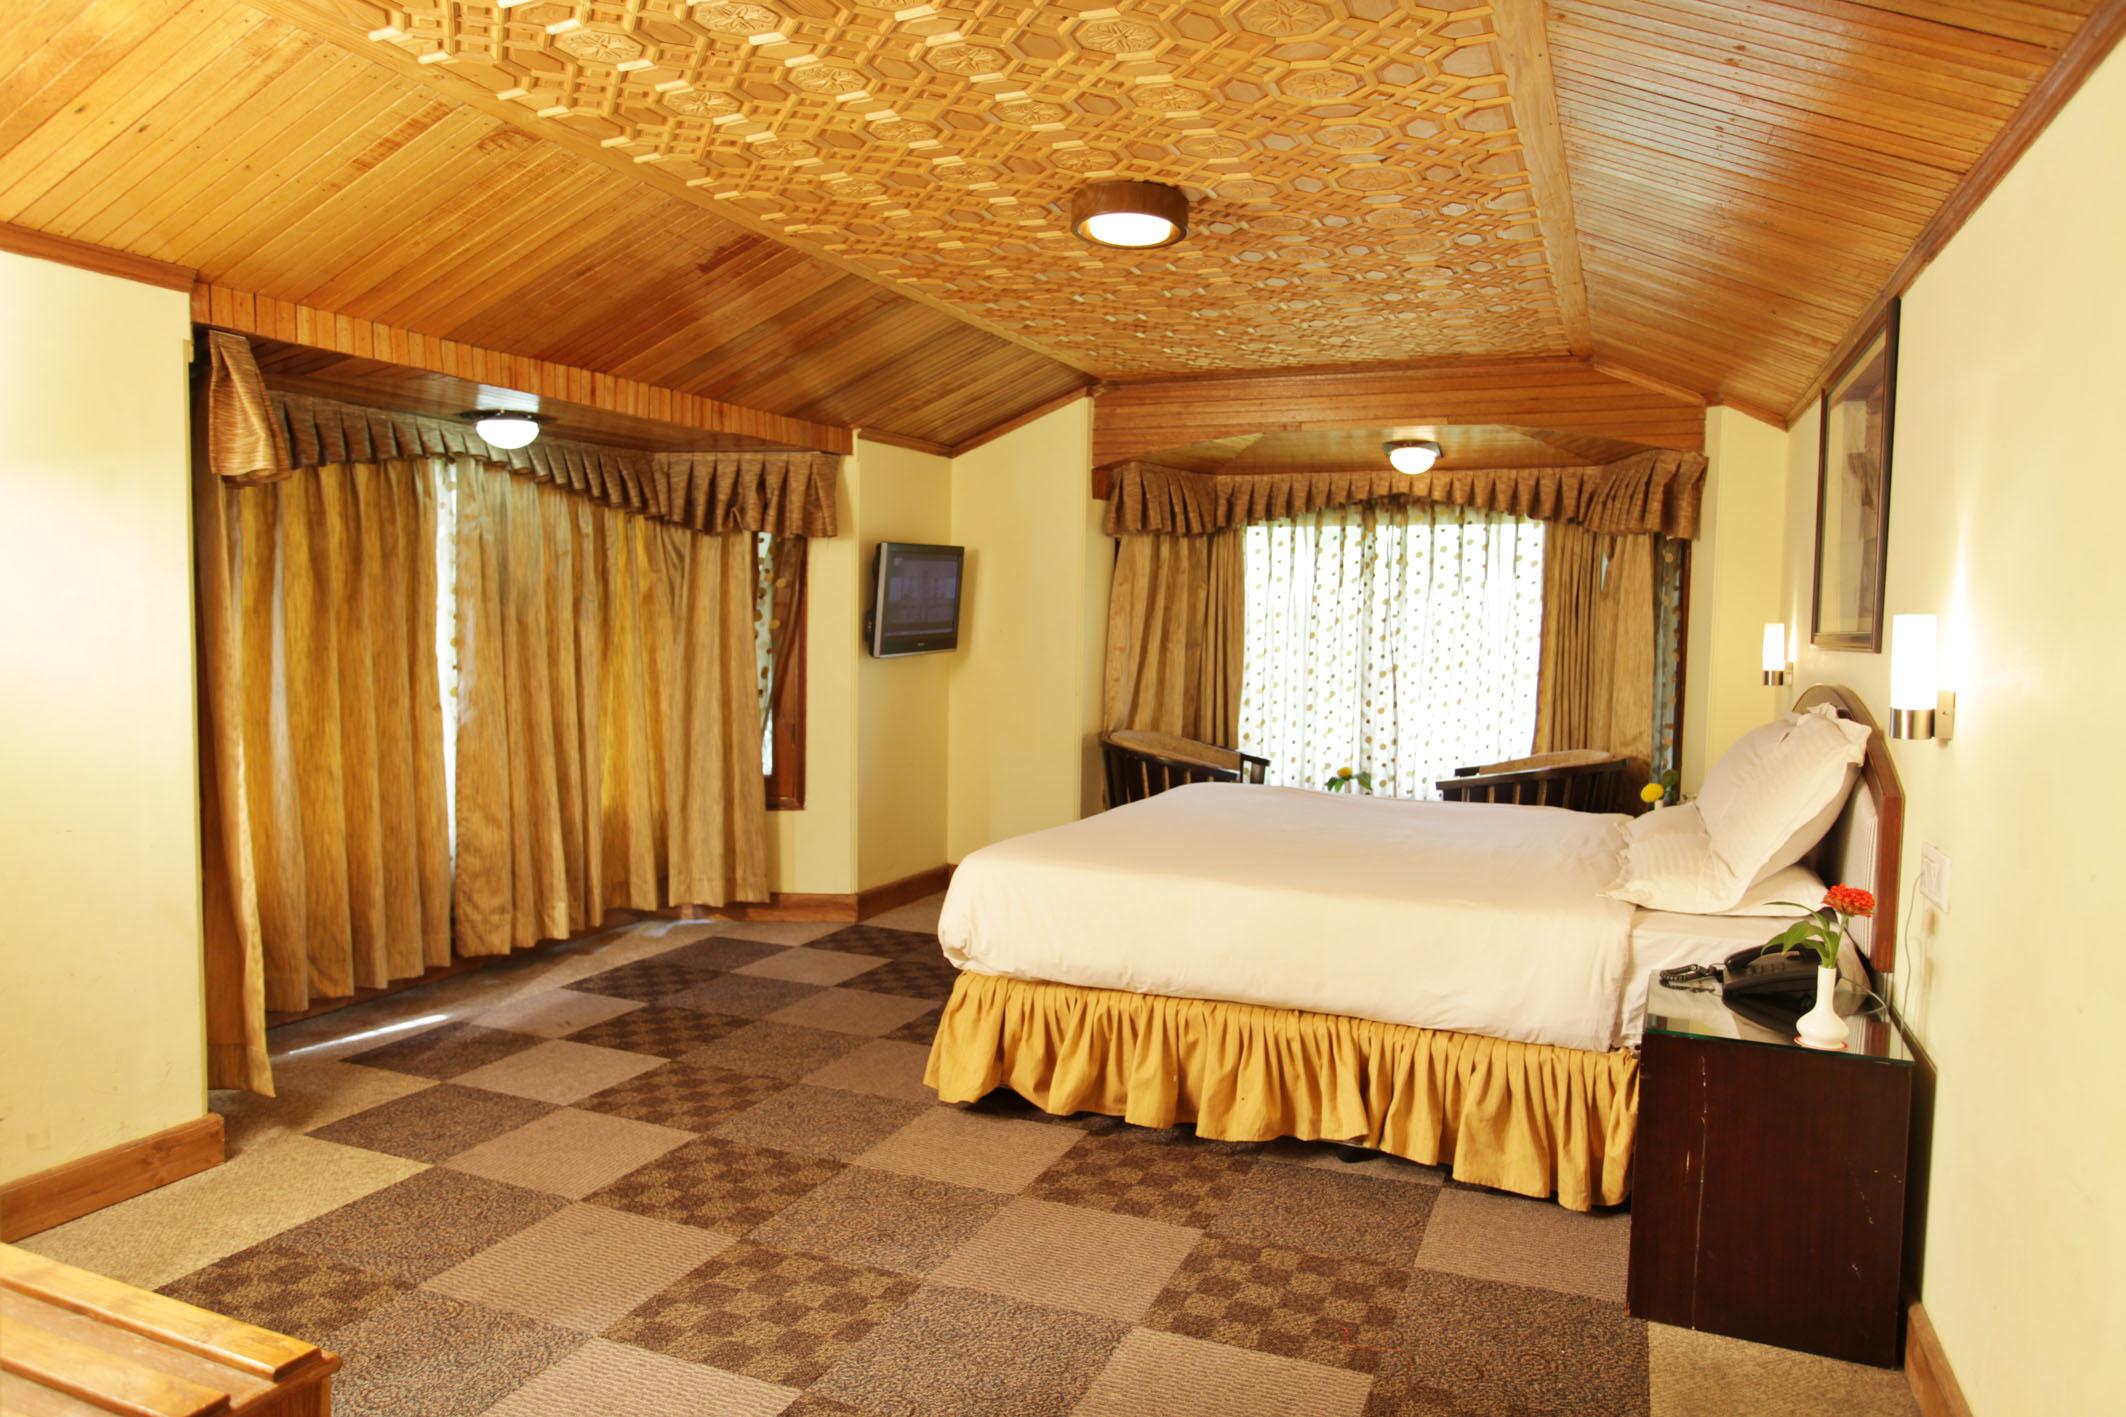 http://grandmumtaz.com/wp-content/uploads/2019/02/grand-mumtaz-resorts-pahalgam-17.jpg